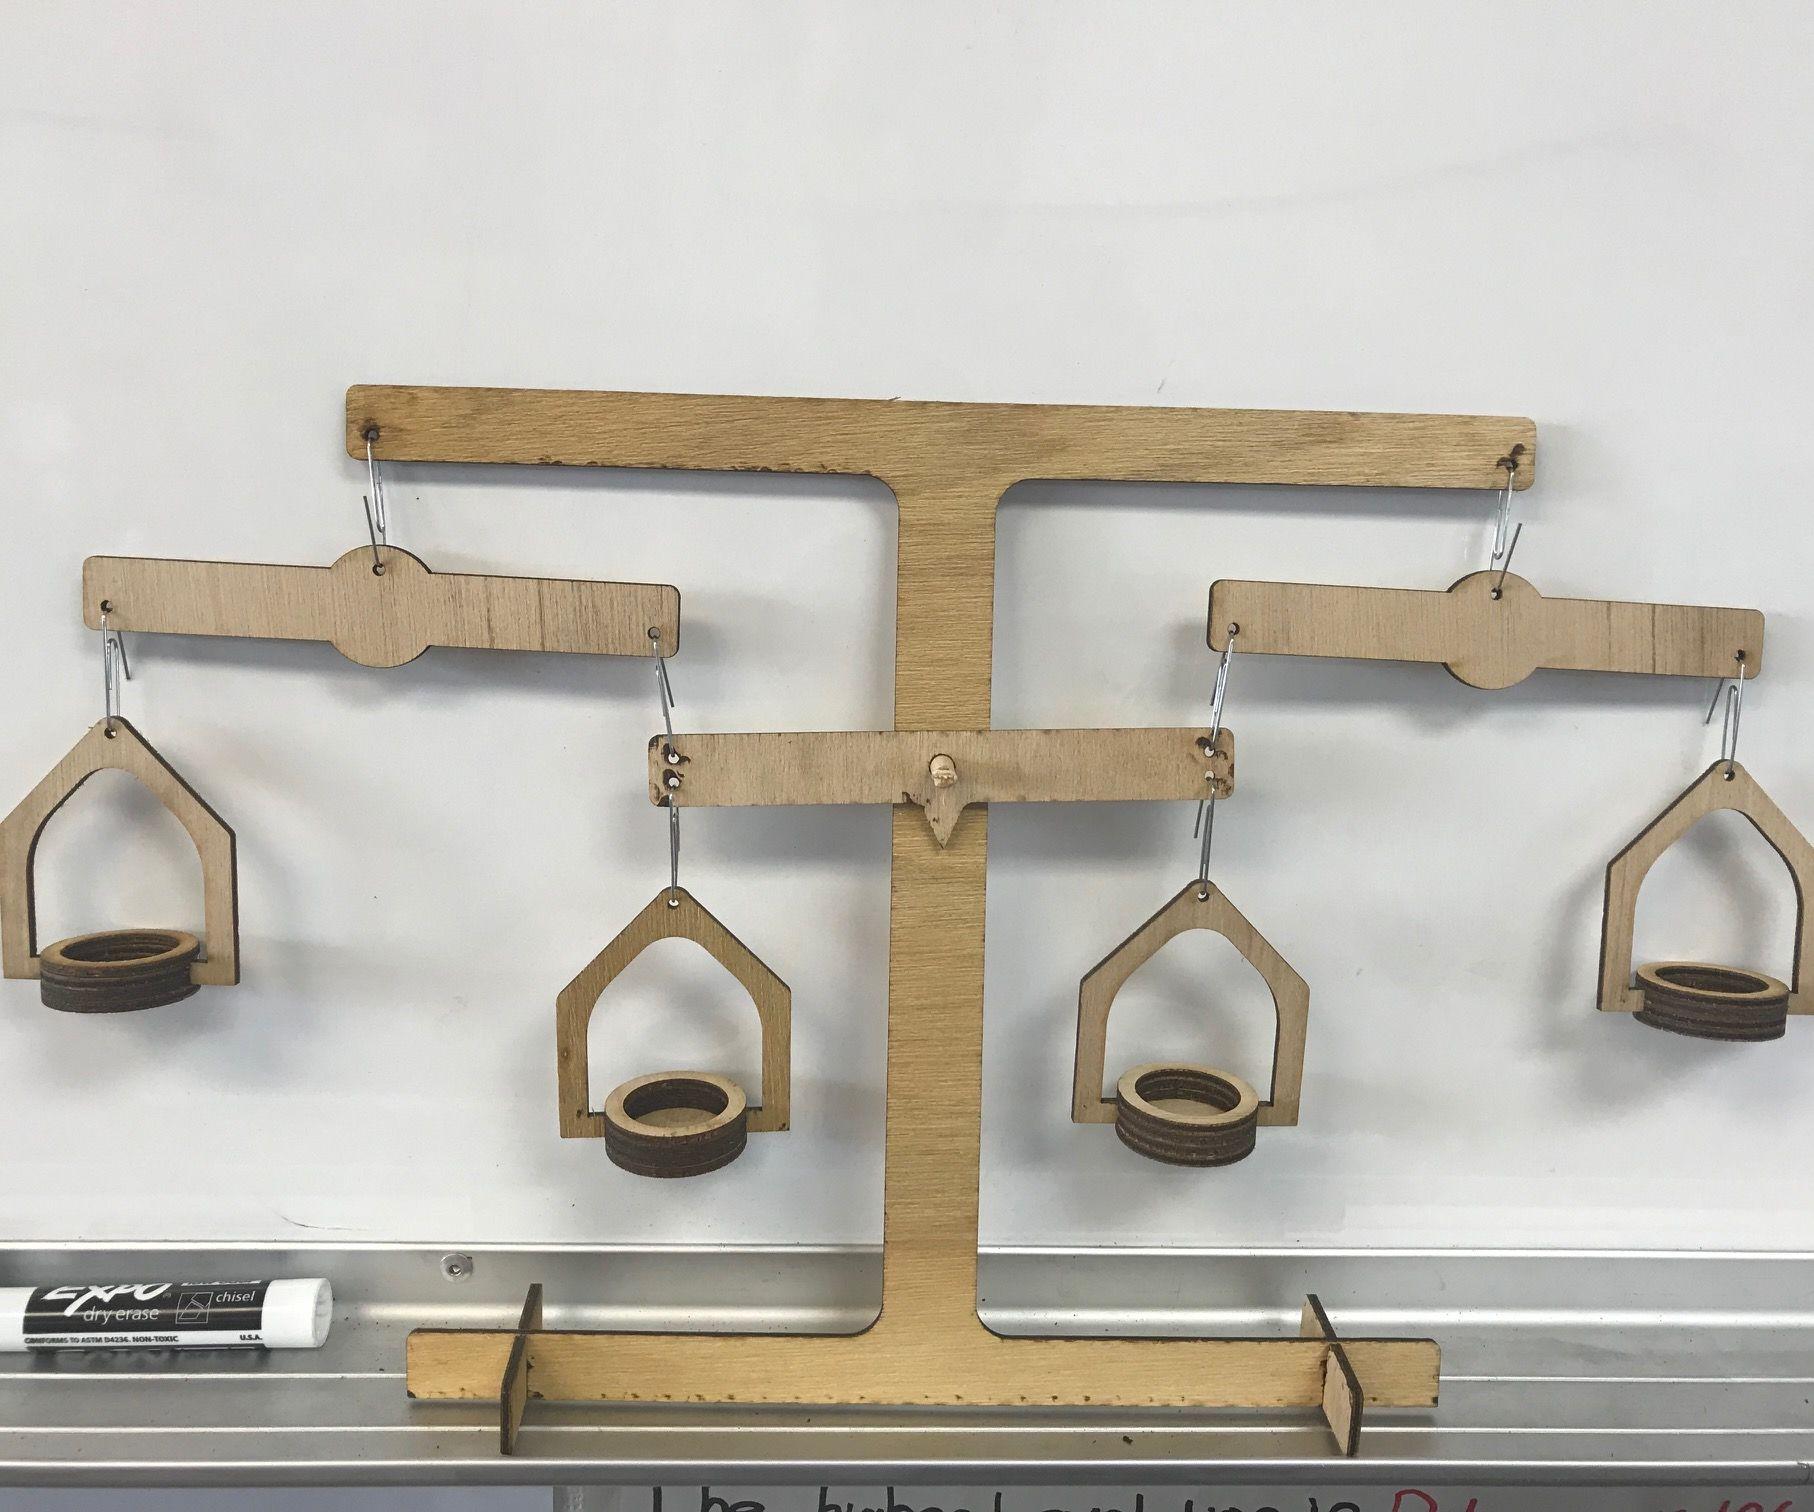 Algebra Balance for Laser Cutting